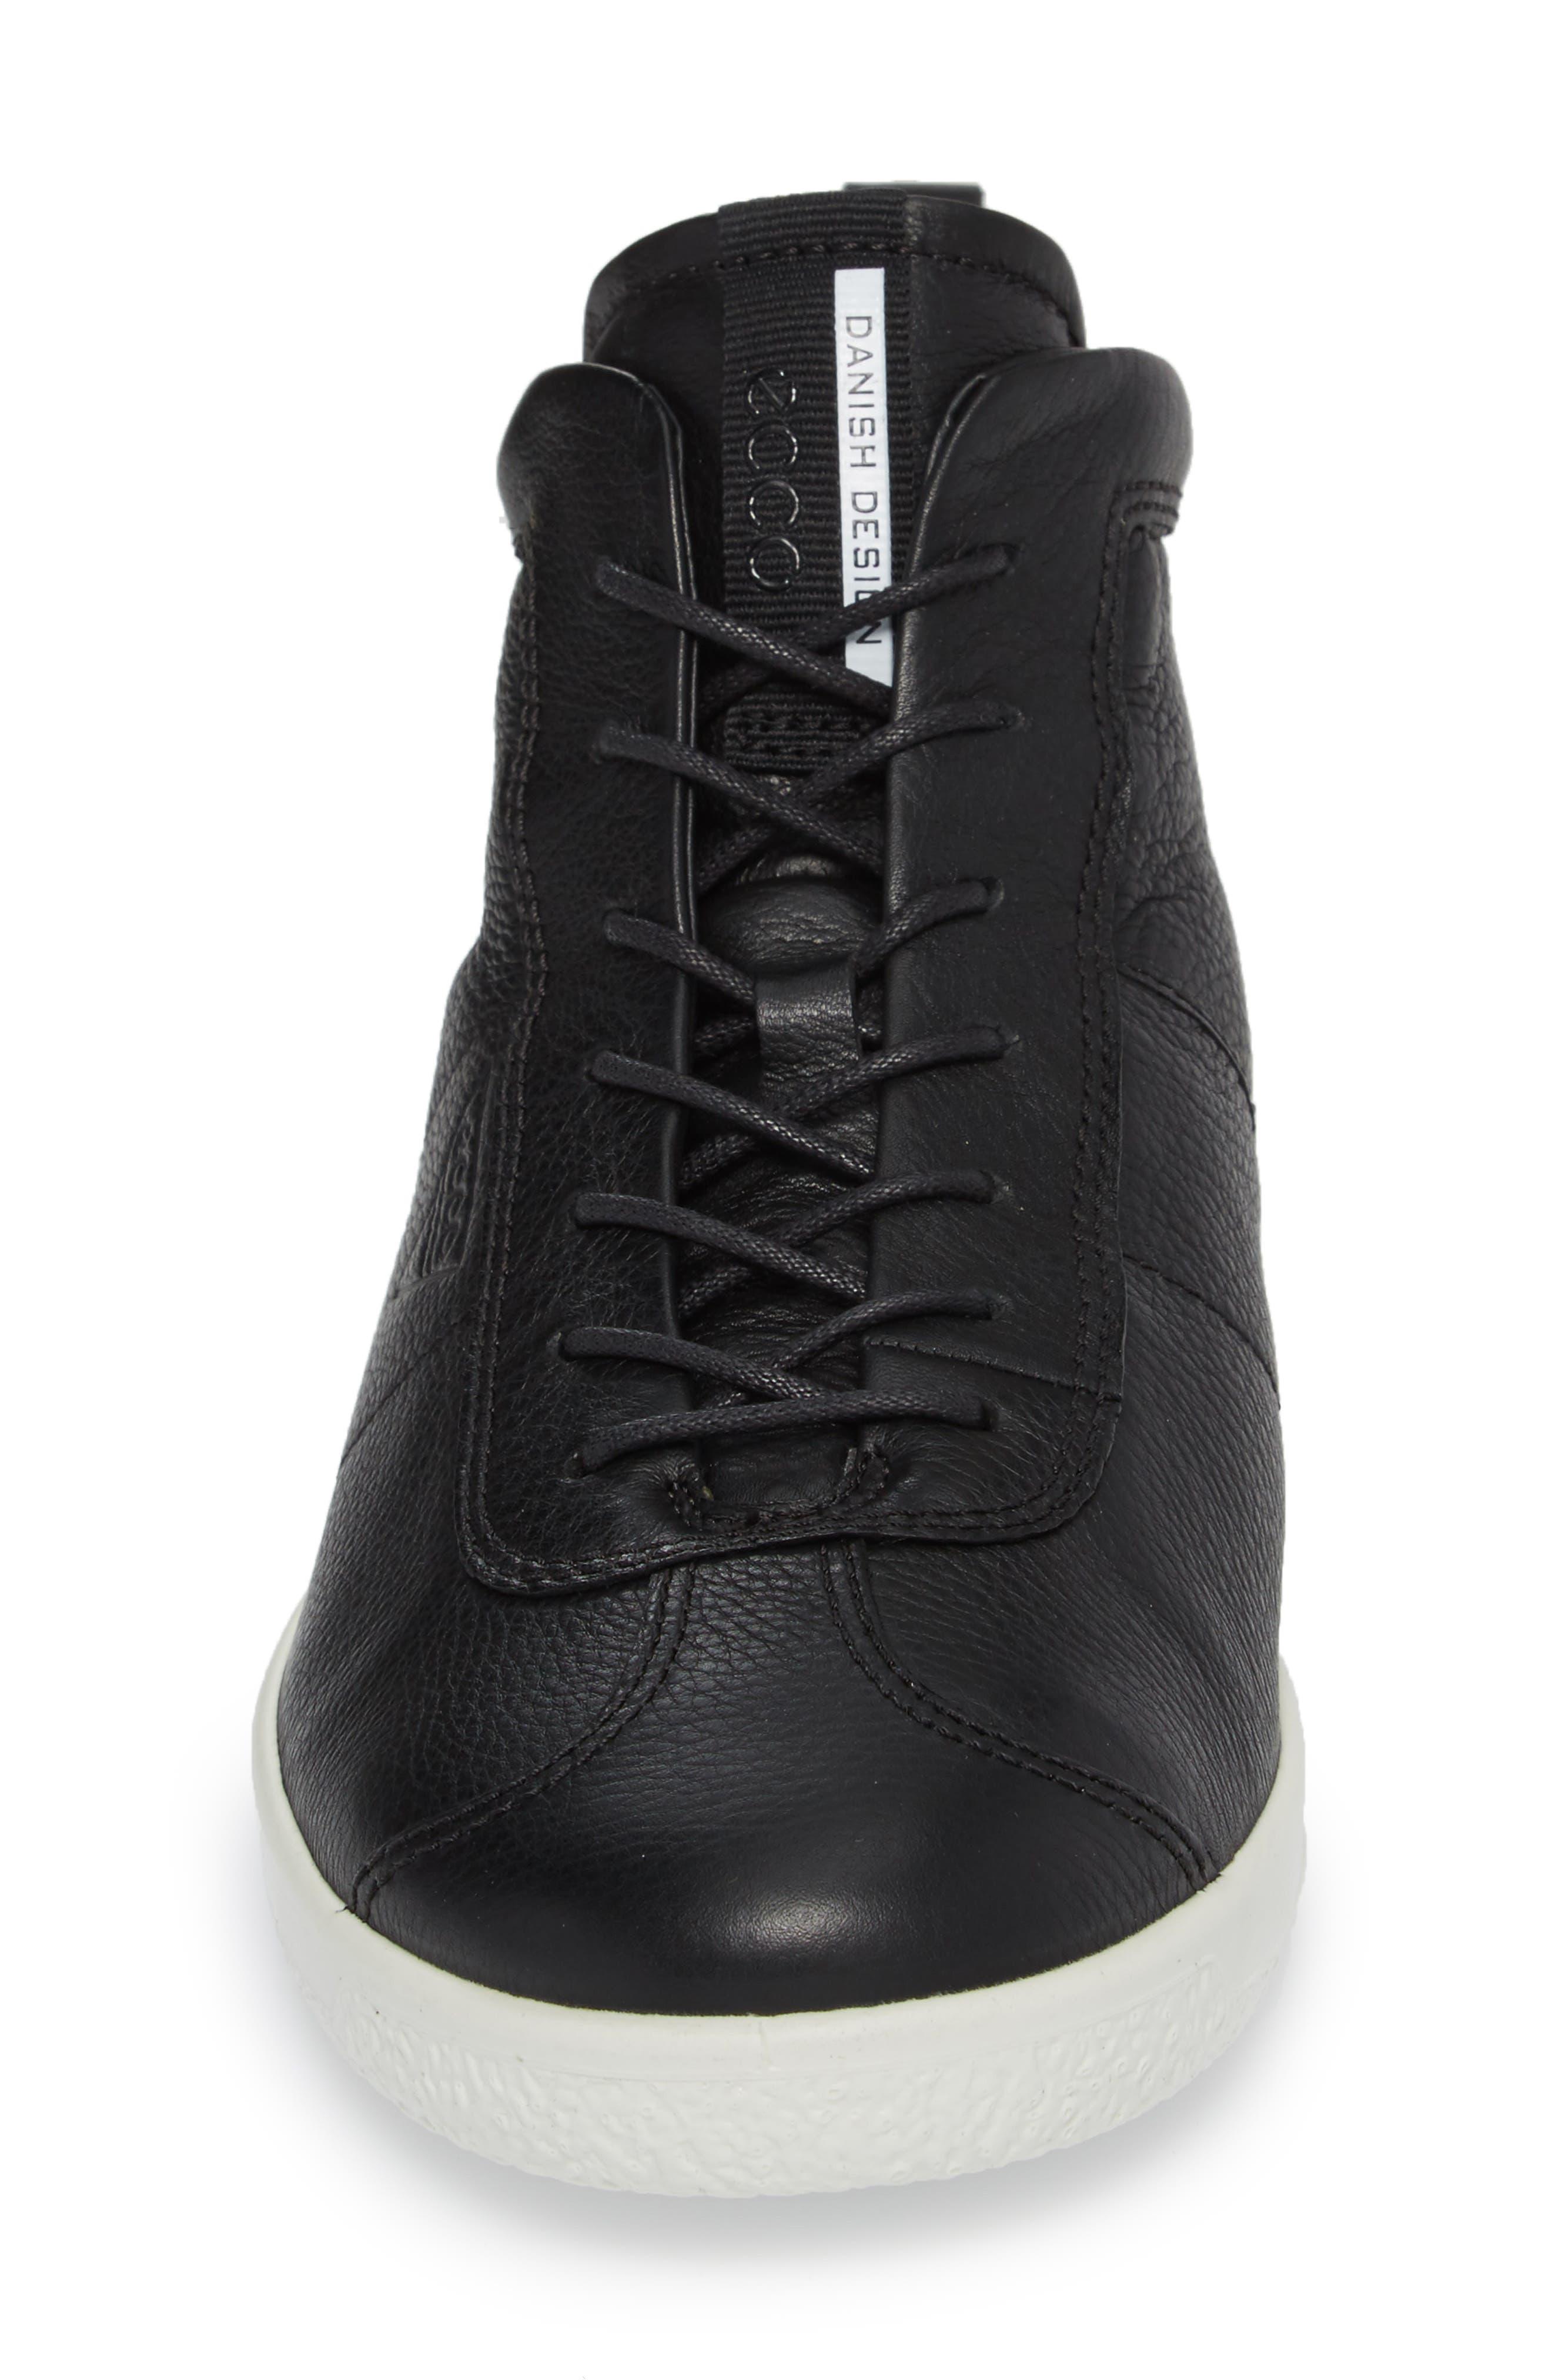 Soft 1 High Top Sneaker,                             Alternate thumbnail 4, color,                             Black Nubuck